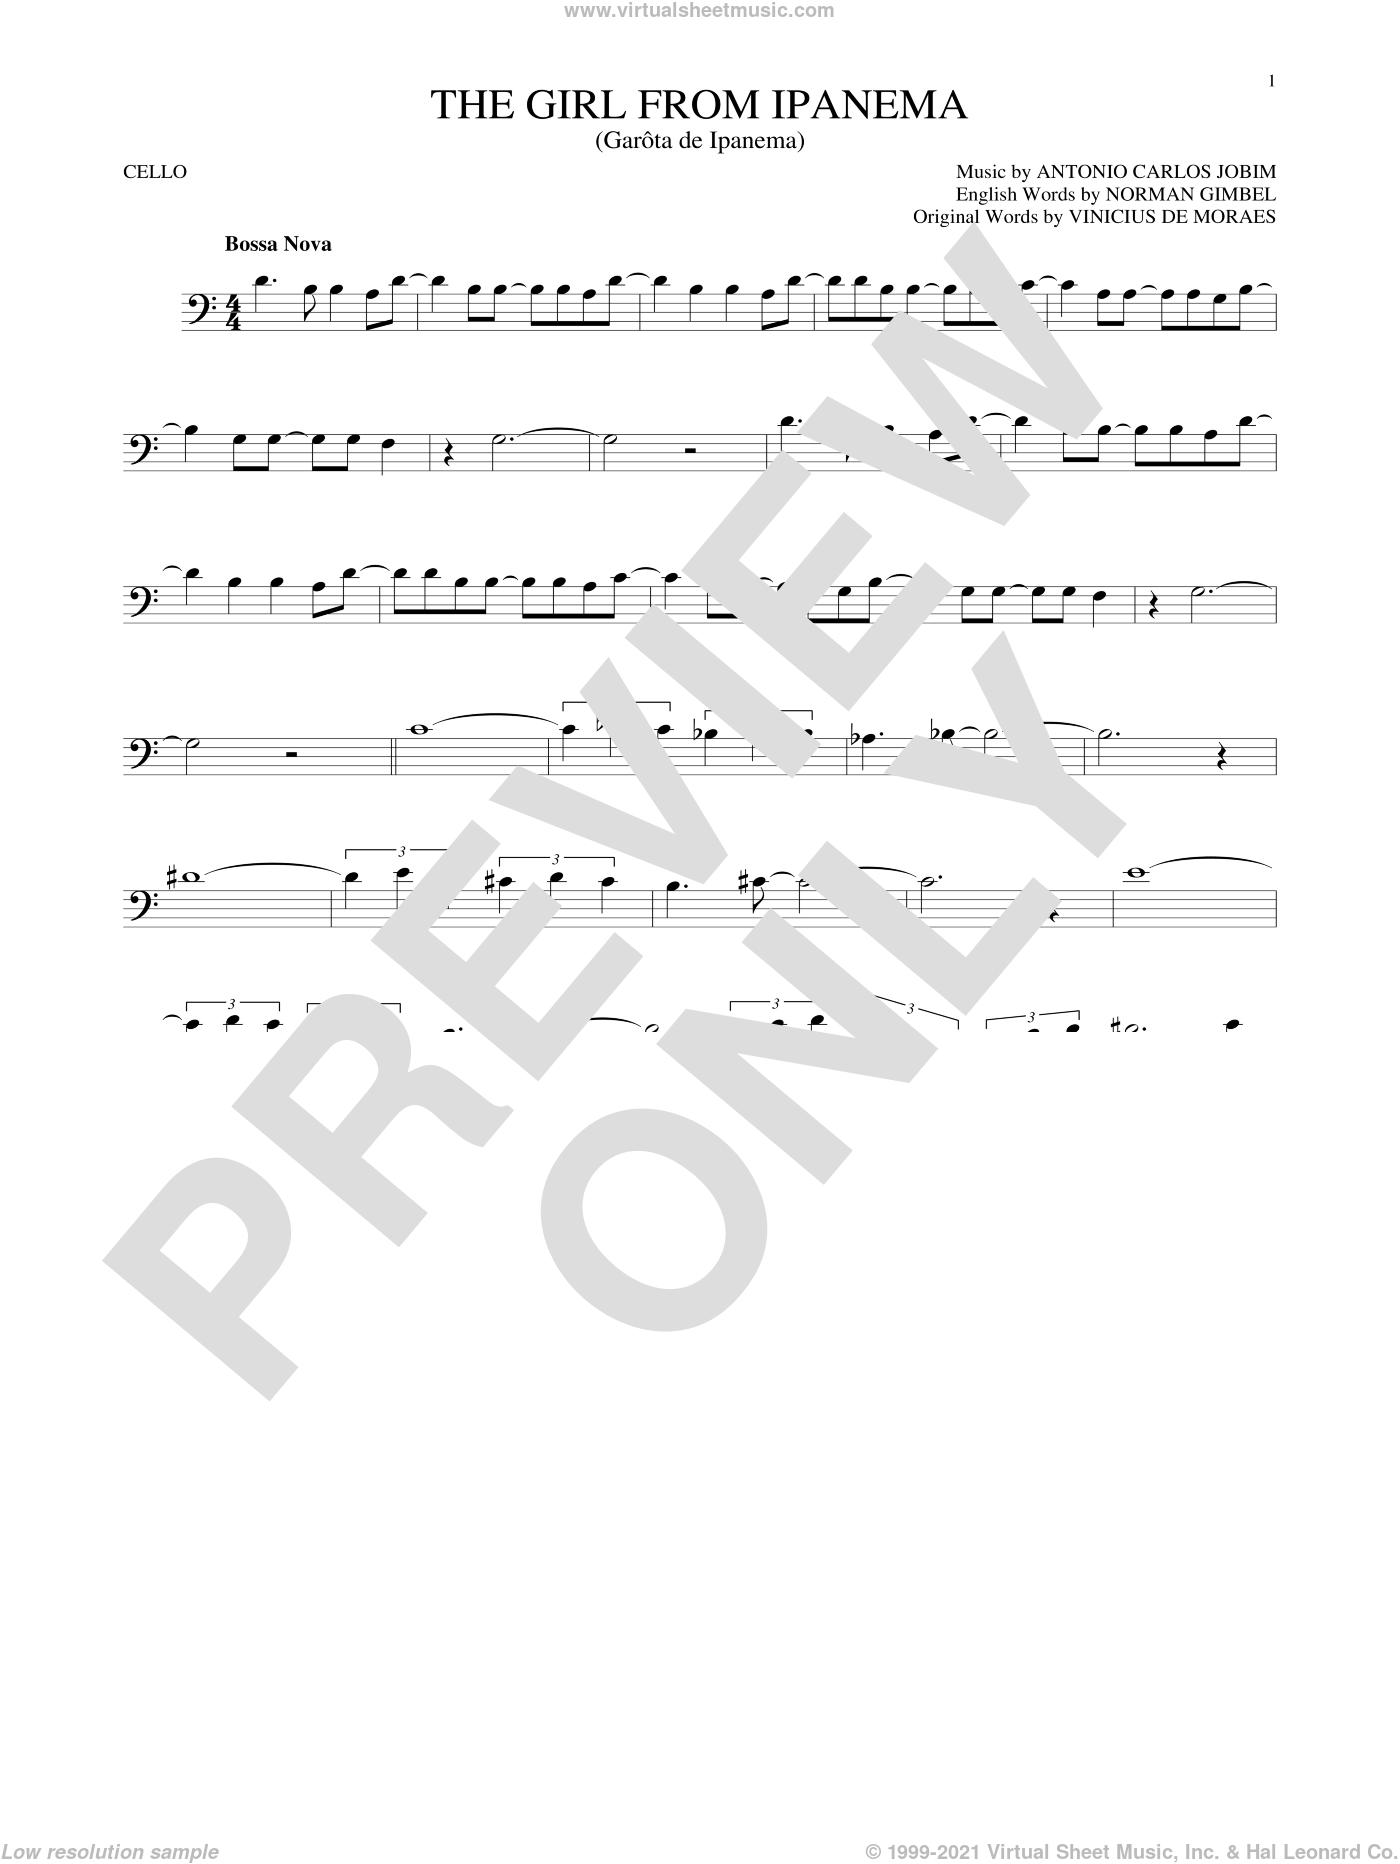 The Girl From Ipanema (Garota De Ipanema) sheet music for cello solo by Norman Gimbel, Stan Getz & Astrud Gilberto, Antonio Carlos Jobim and Vinicius de Moraes, intermediate skill level